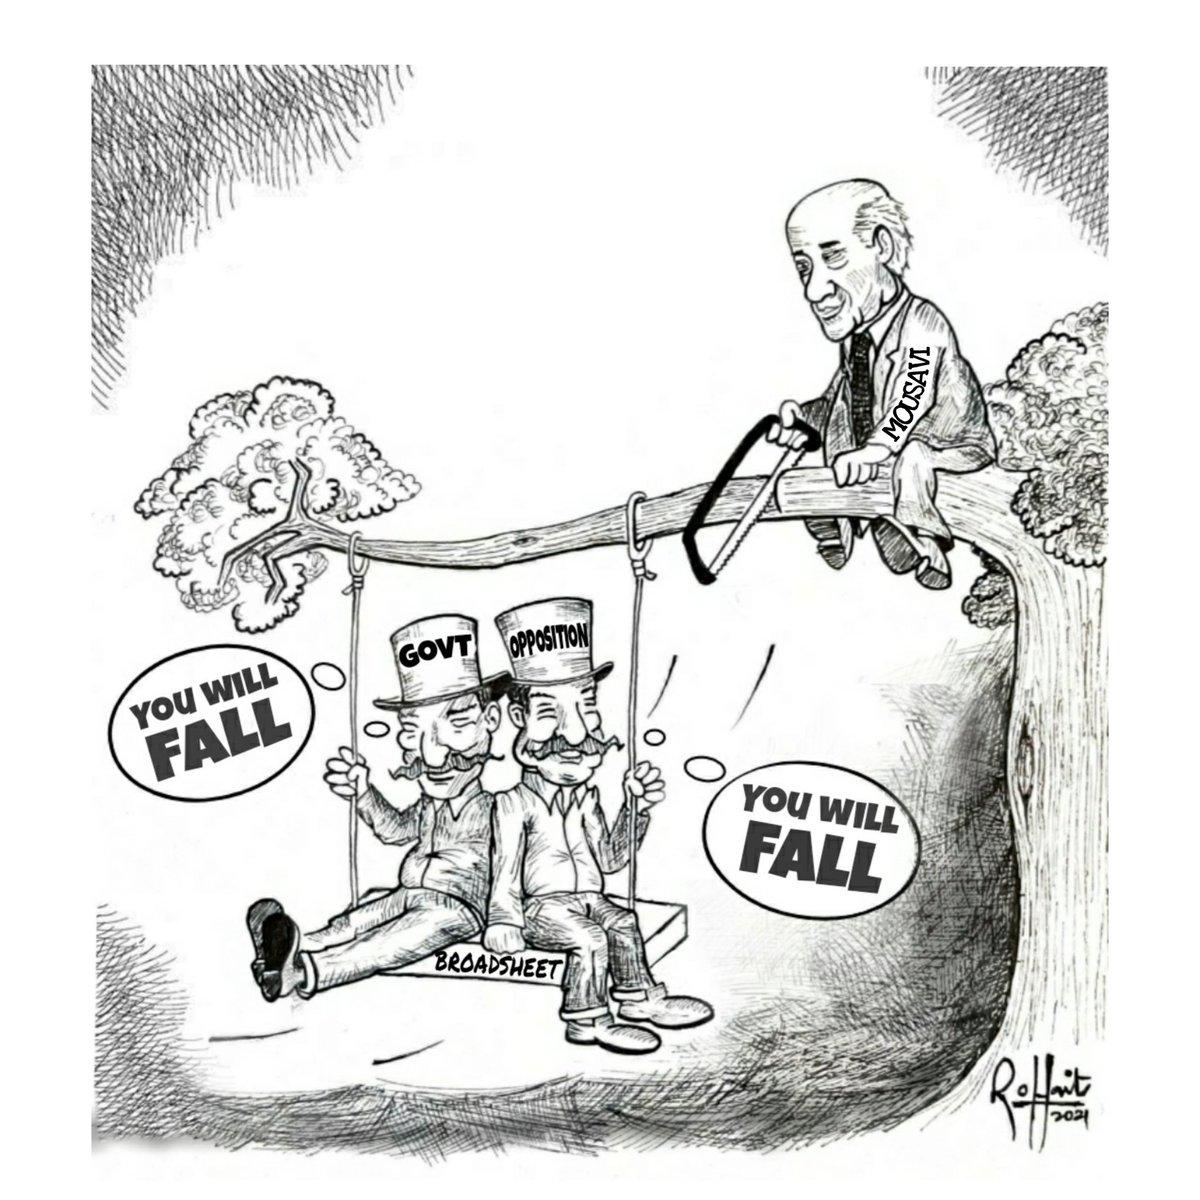 A cartoon is enough for the wise @KavehMoussavi #BroadsheetScandal #Broadsheet #Government #opposition #politics #PTIGovernment #politicalcartoons